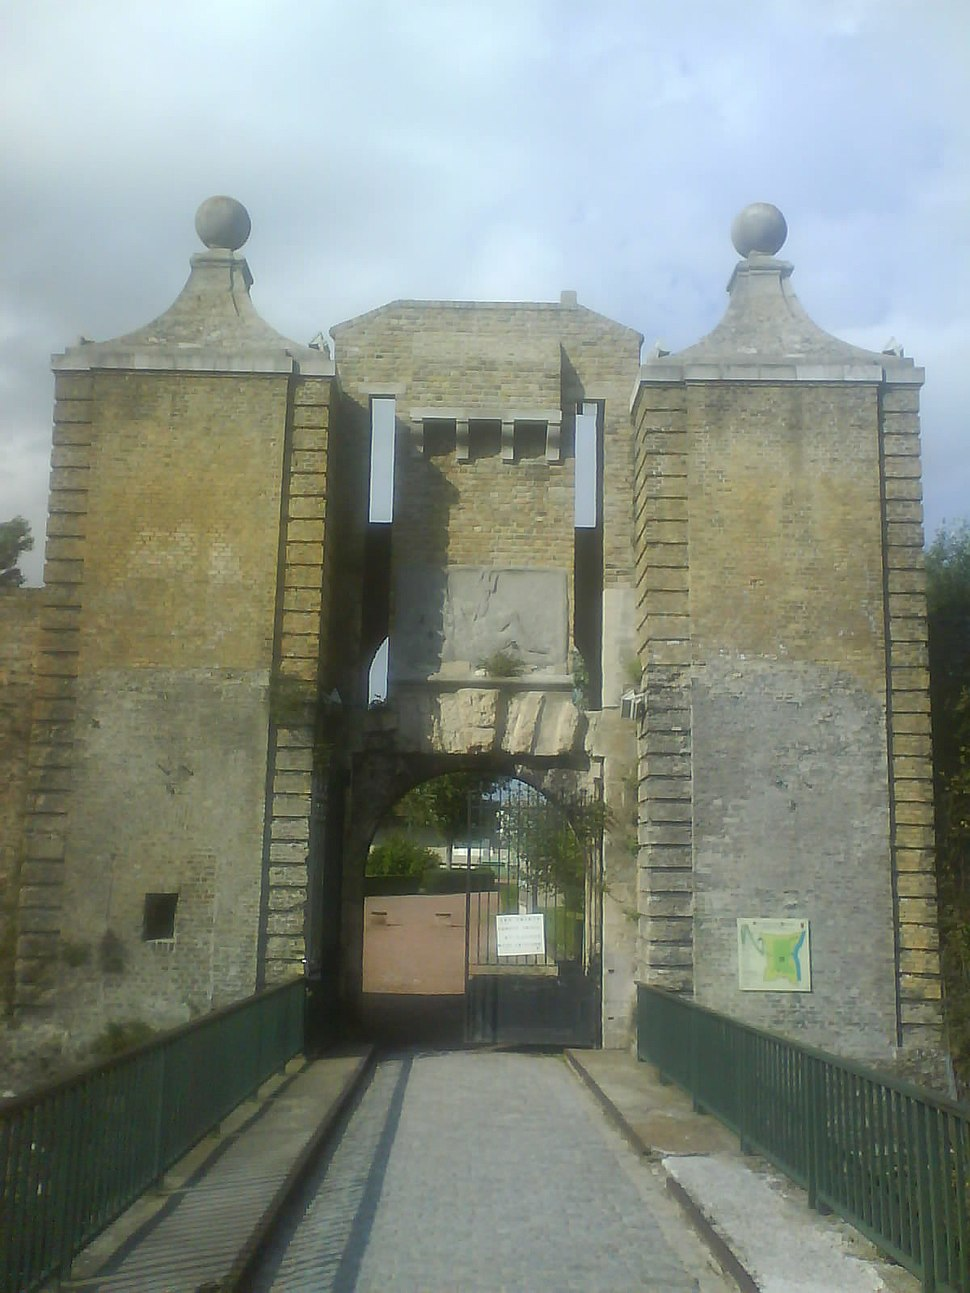 Citadelle de Calais - La Porte de Neptune